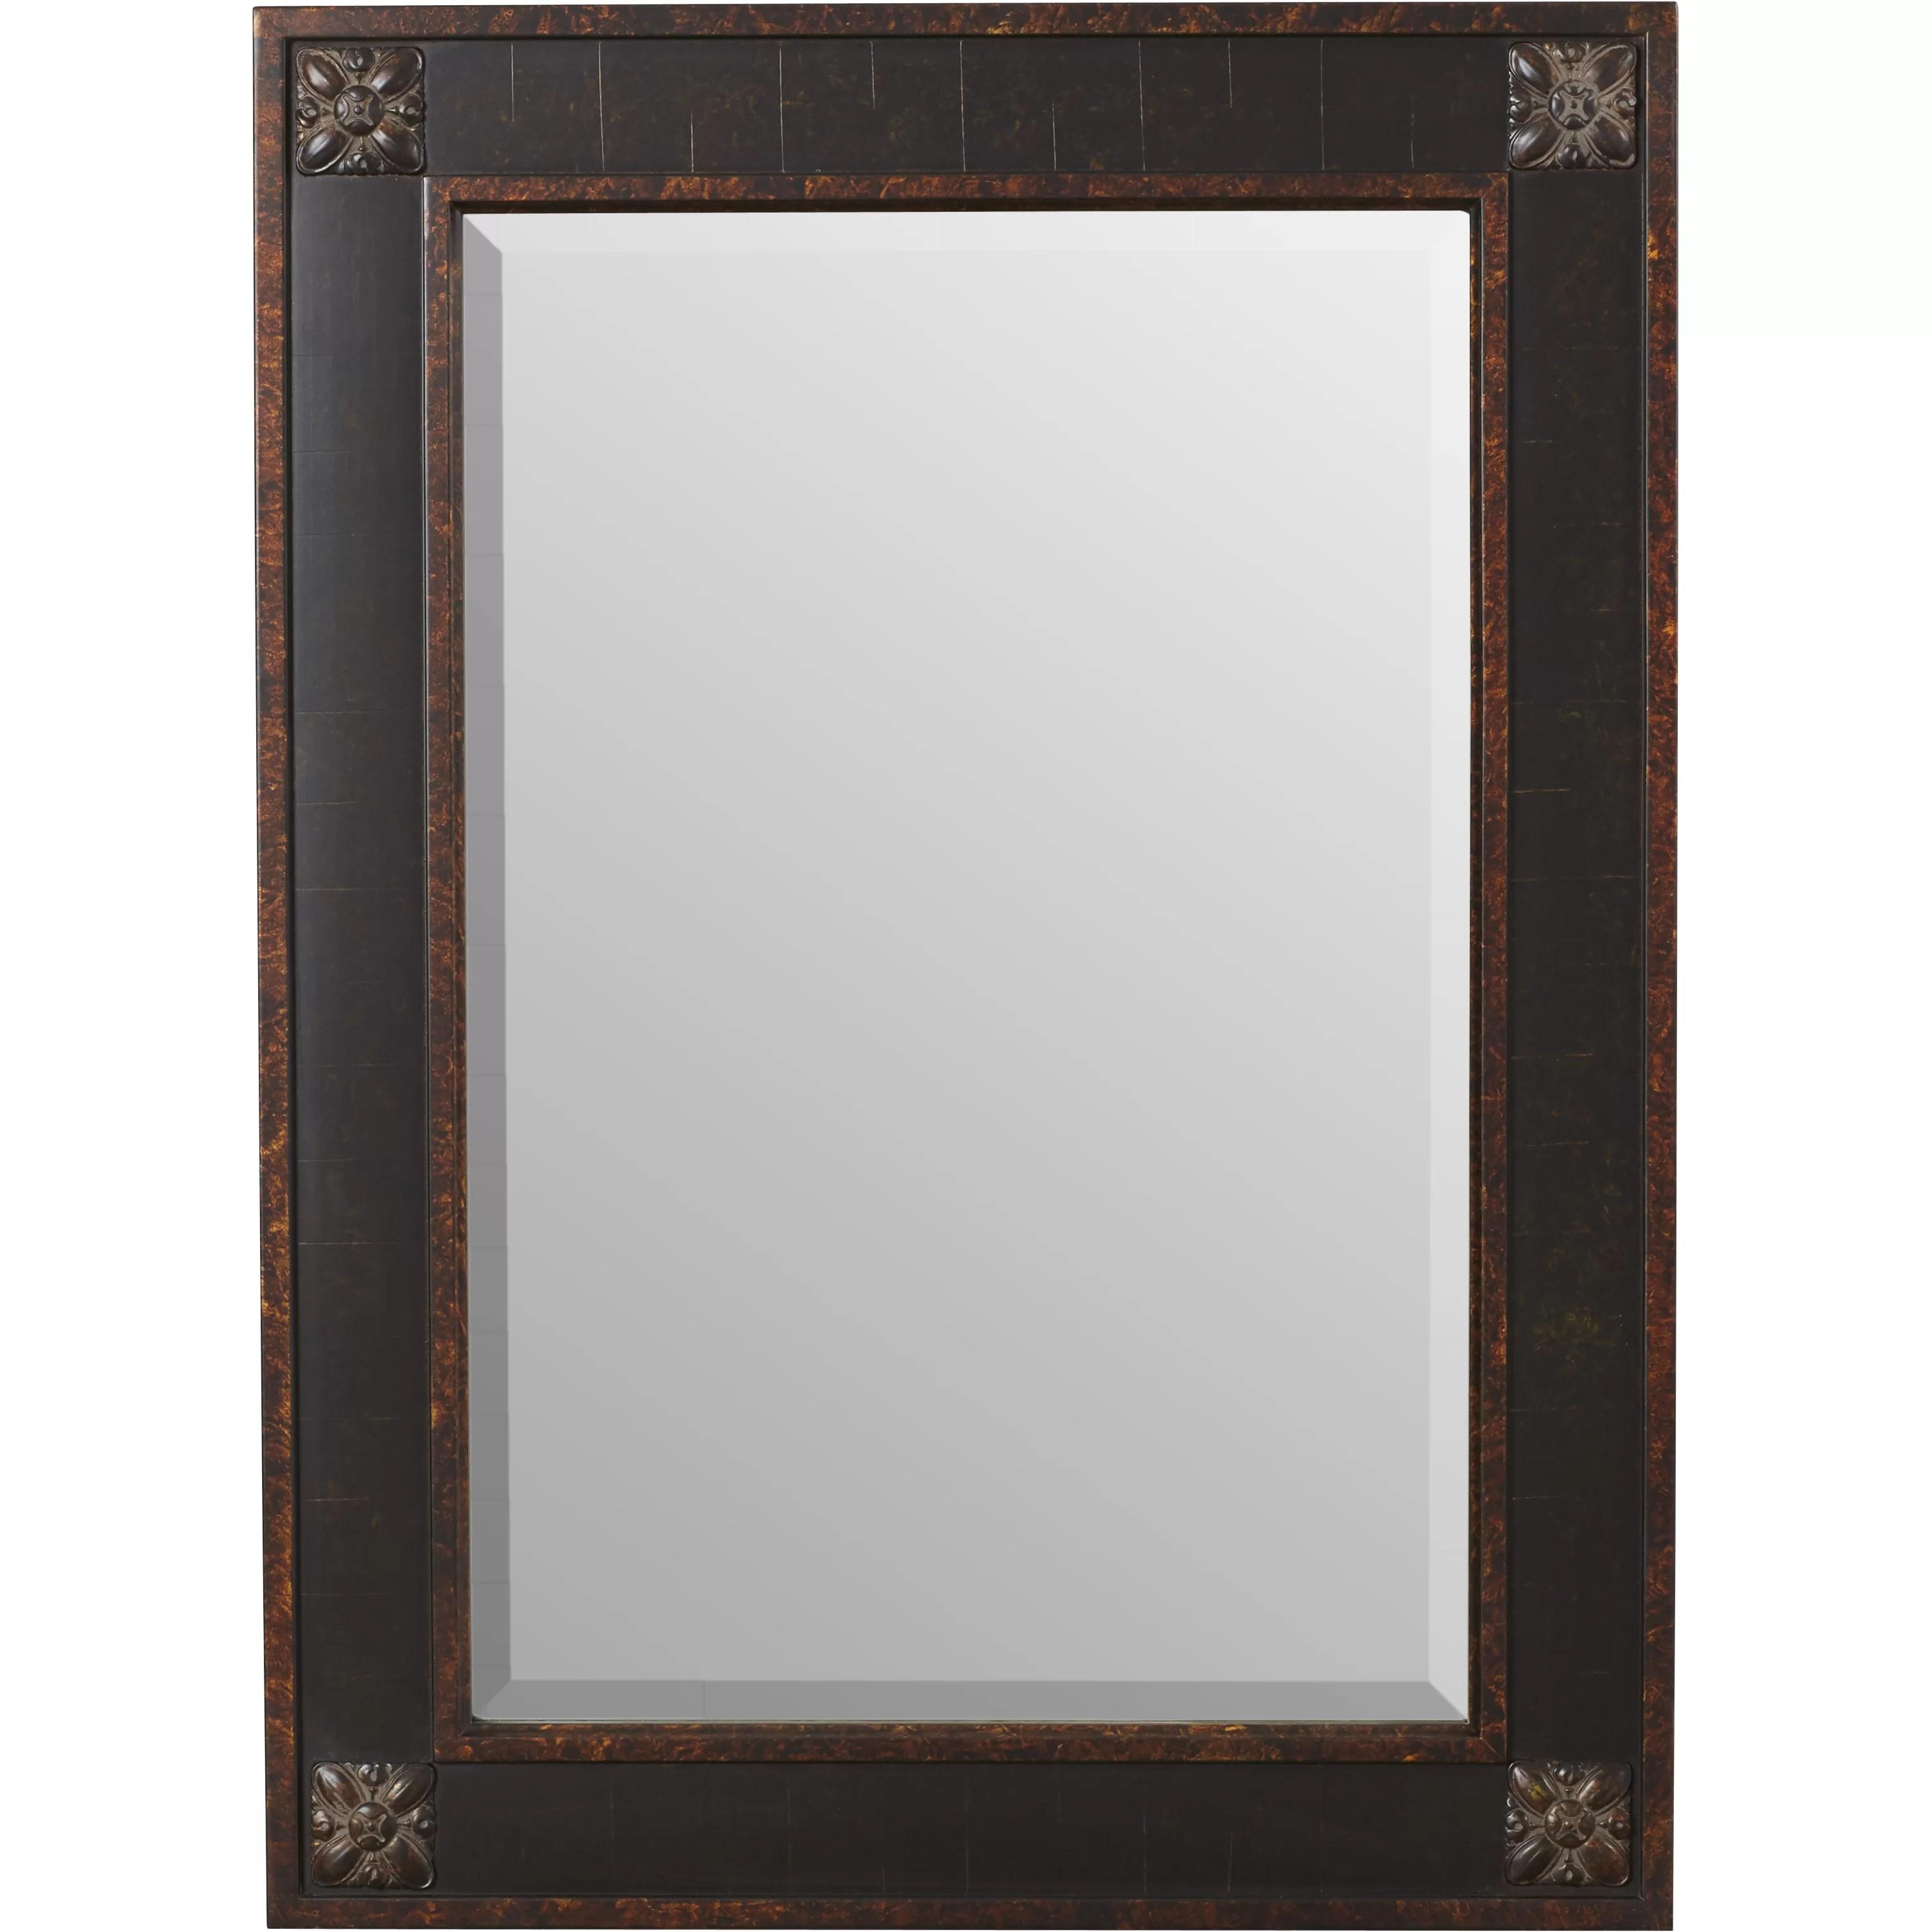 Rosalind Wheeler Rectangular Beveled Vanity Mirror in Distressed Walnut Brown  Reviews  Wayfair